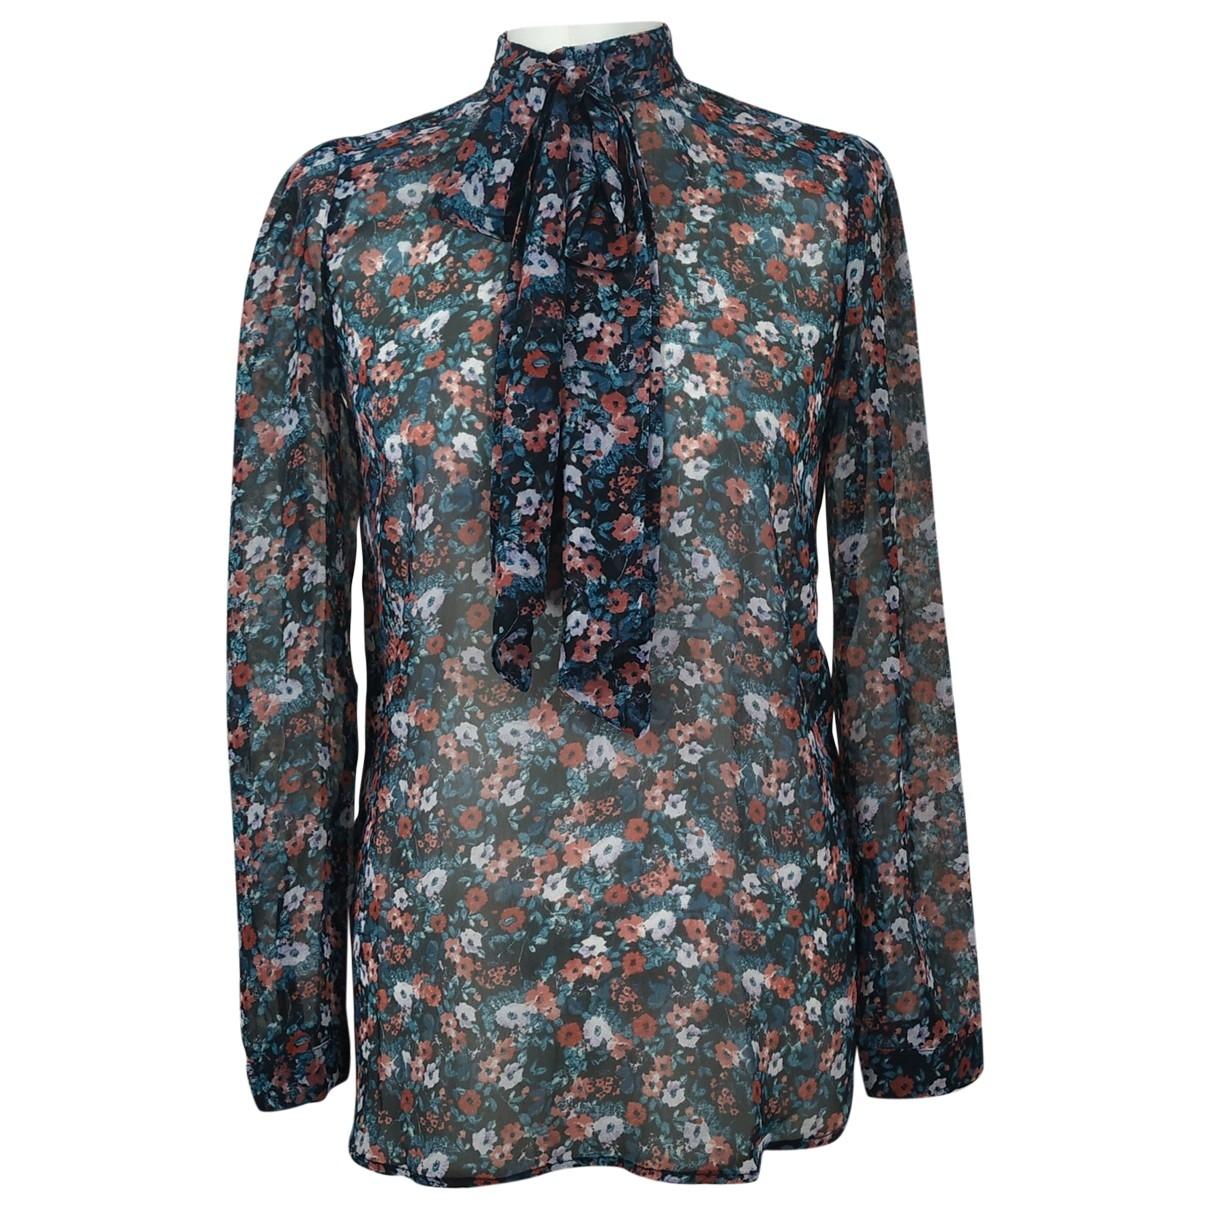 Zara \N Multicolour  top for Women XS International